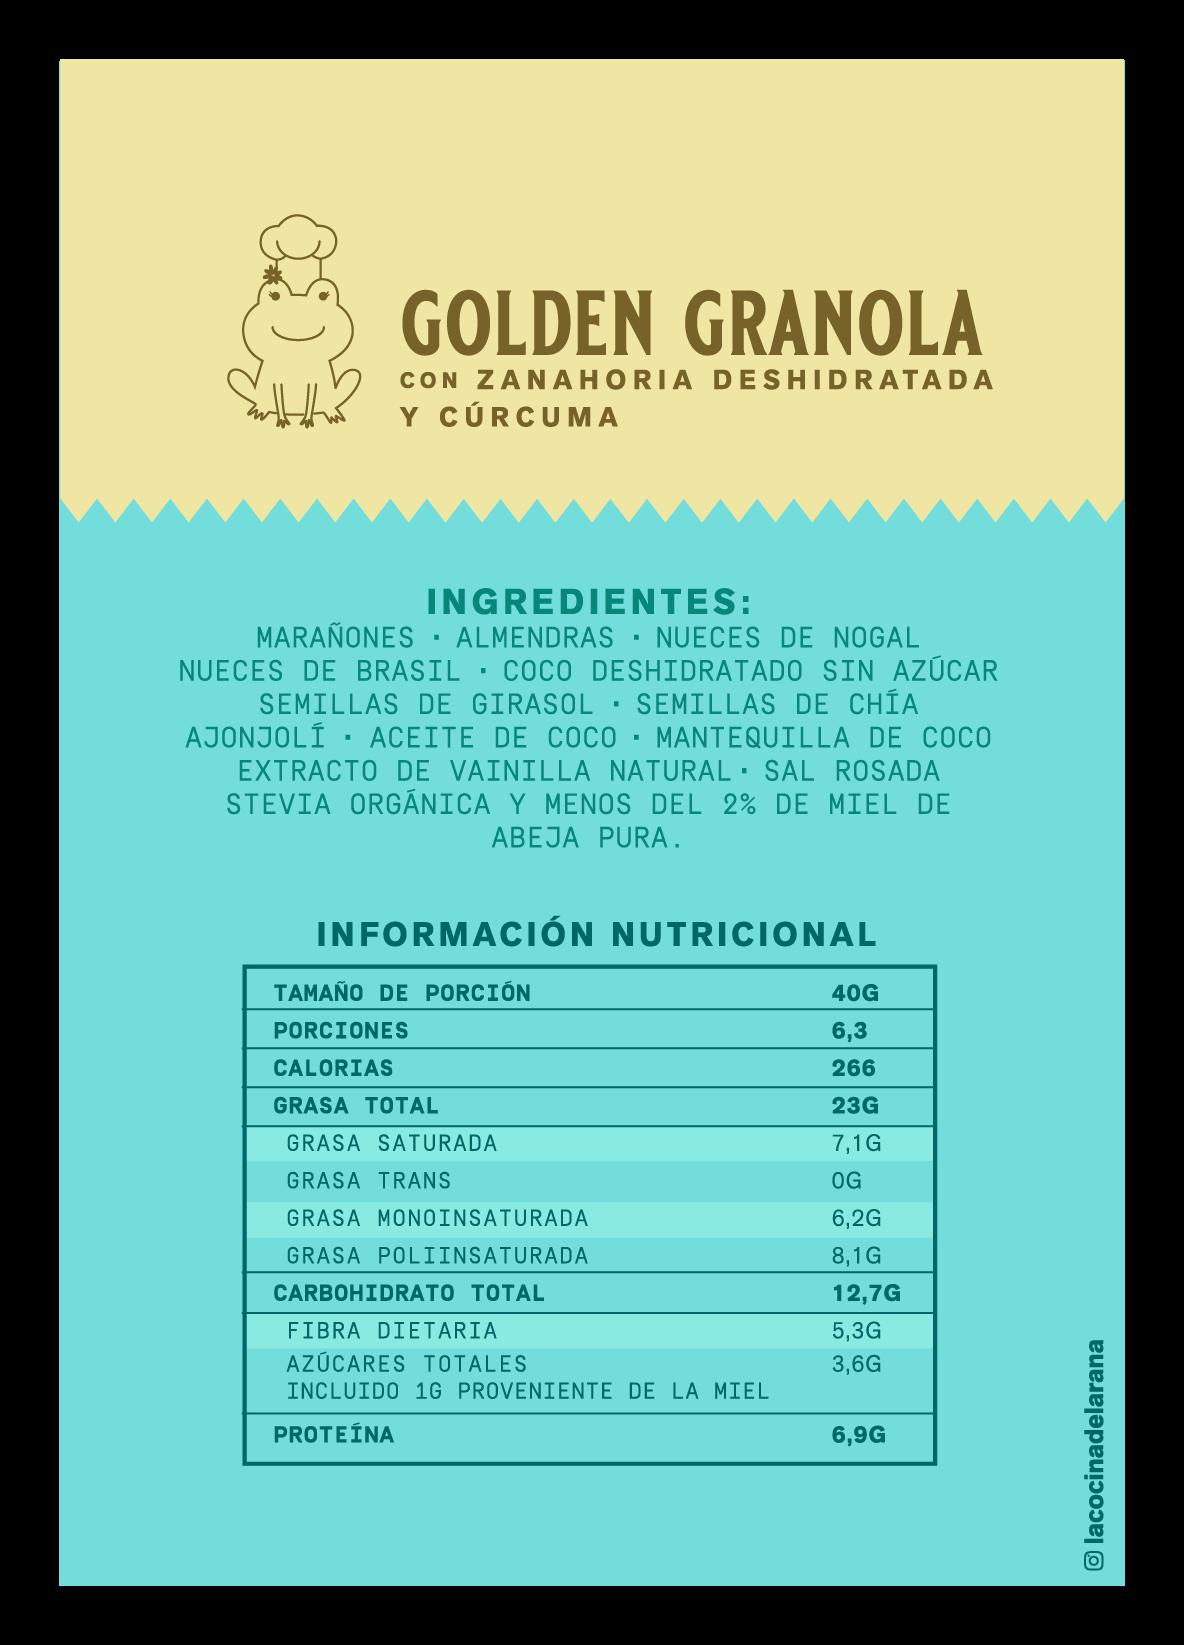 Golden granola